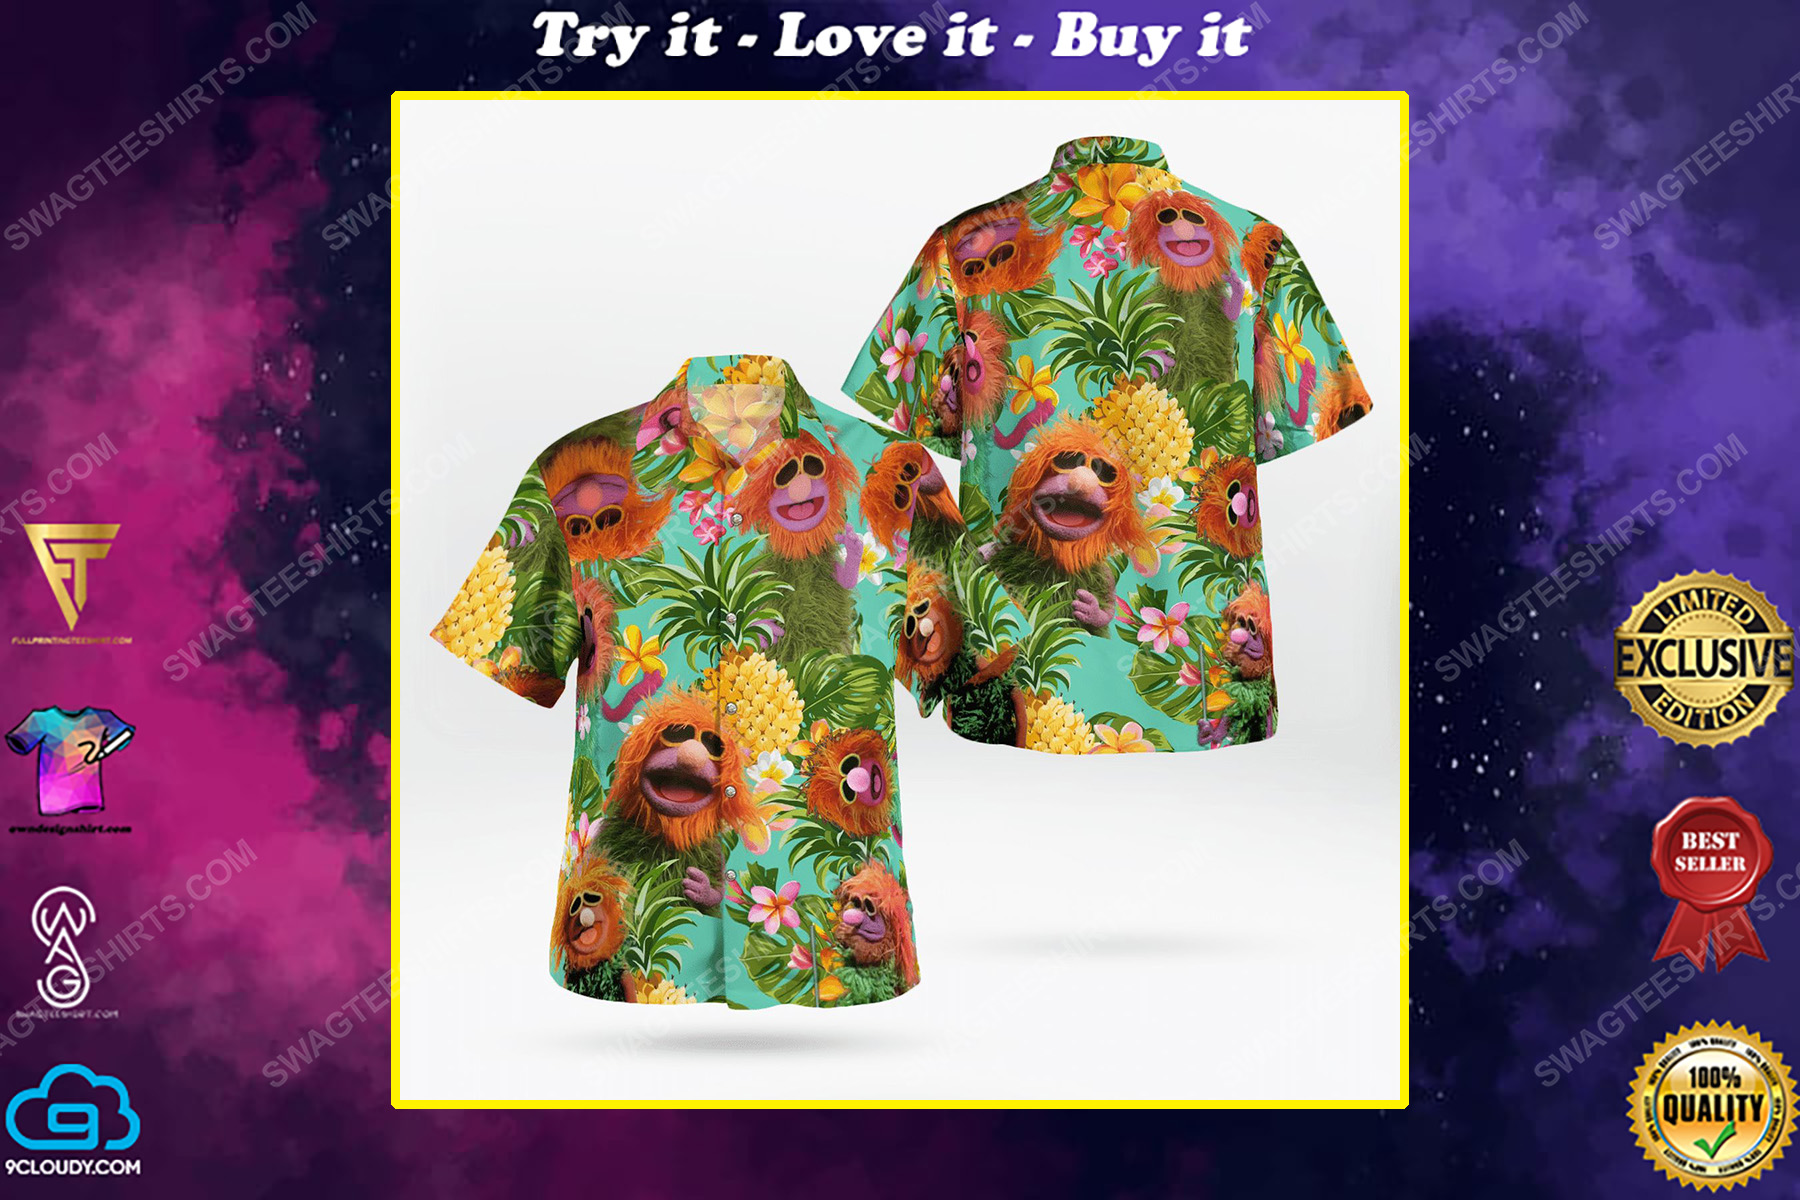 Mahna mahna the muppet show hawaiian shirt